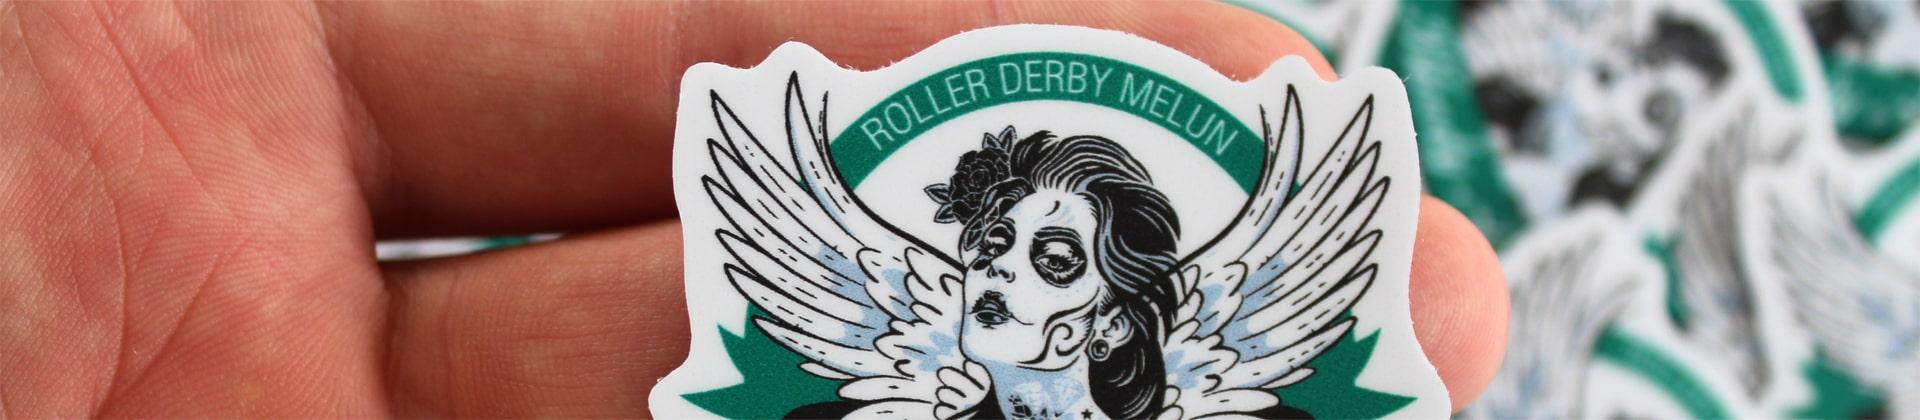 Shop high quality logo stickers for your association